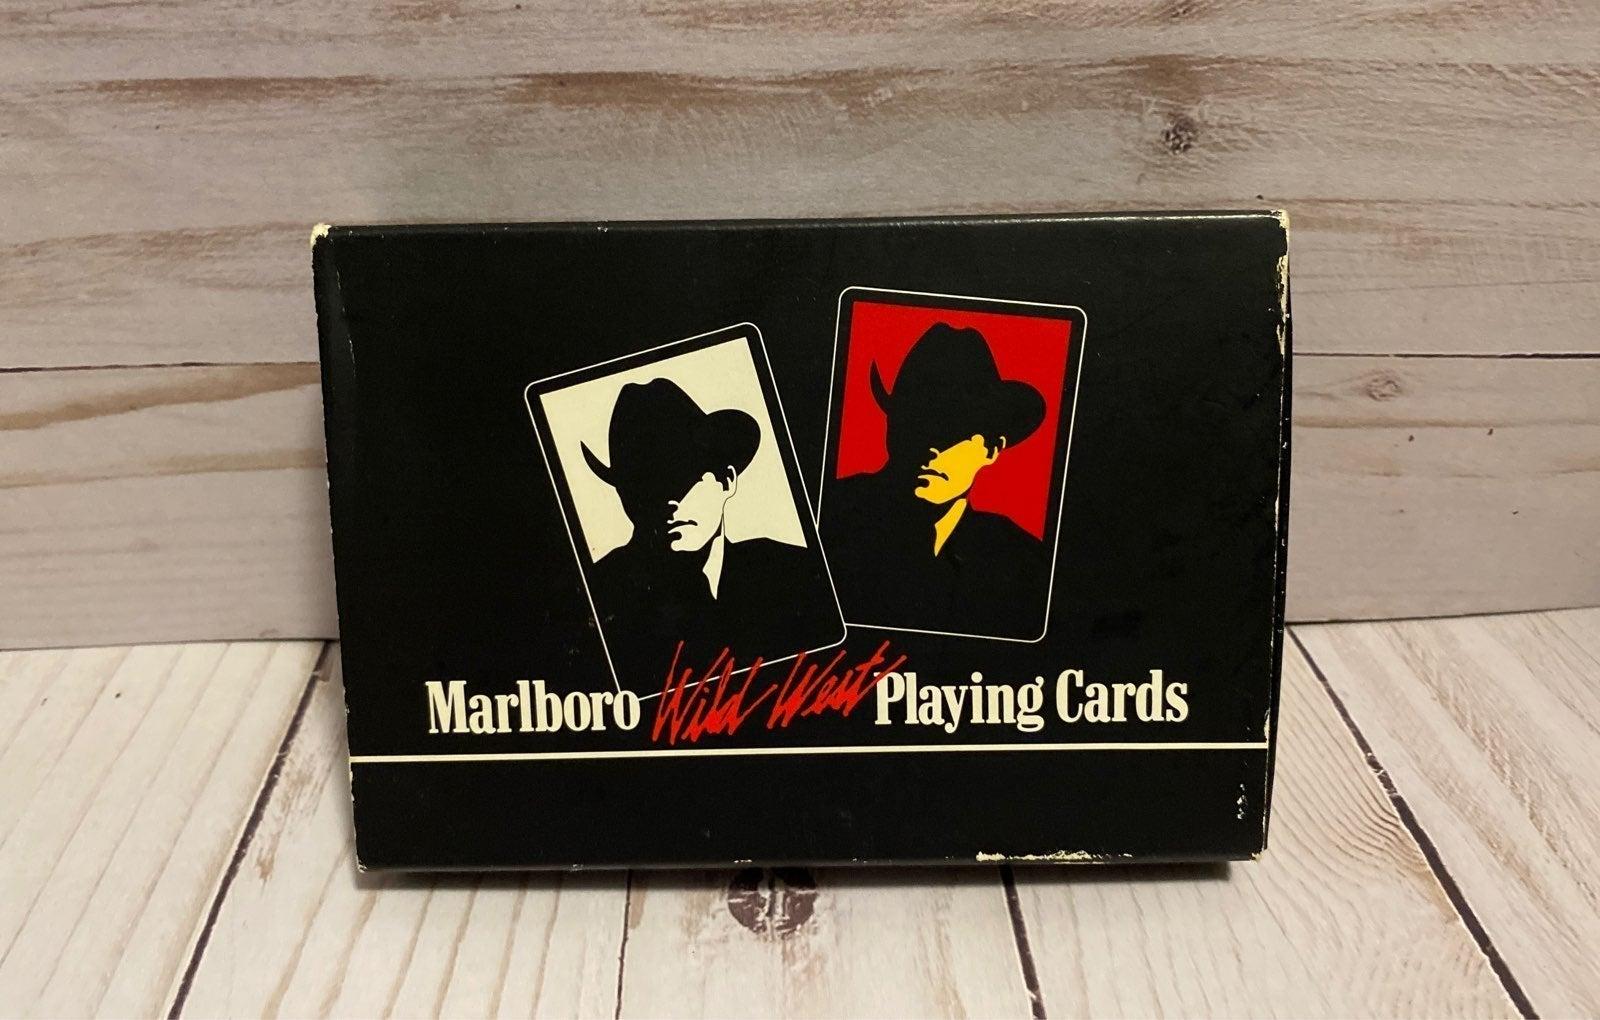 Marlboro Playing Cards